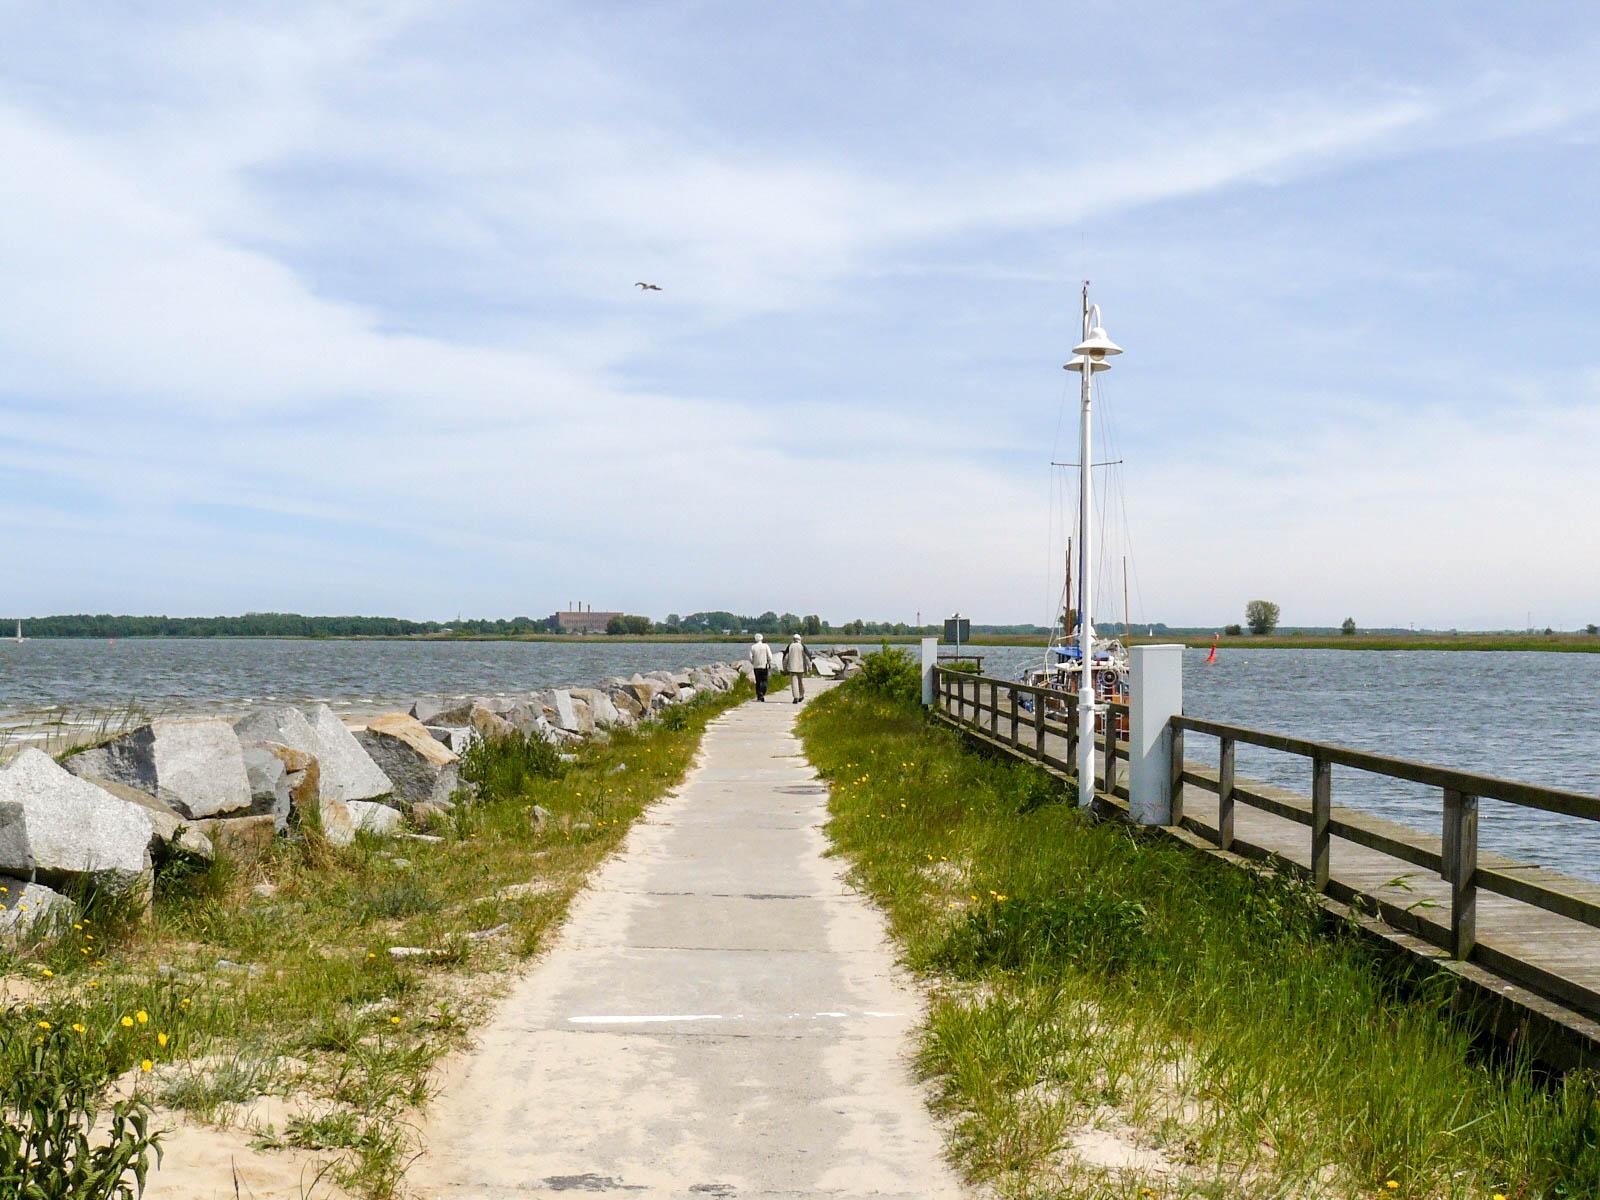 Mole am Freester Hafen